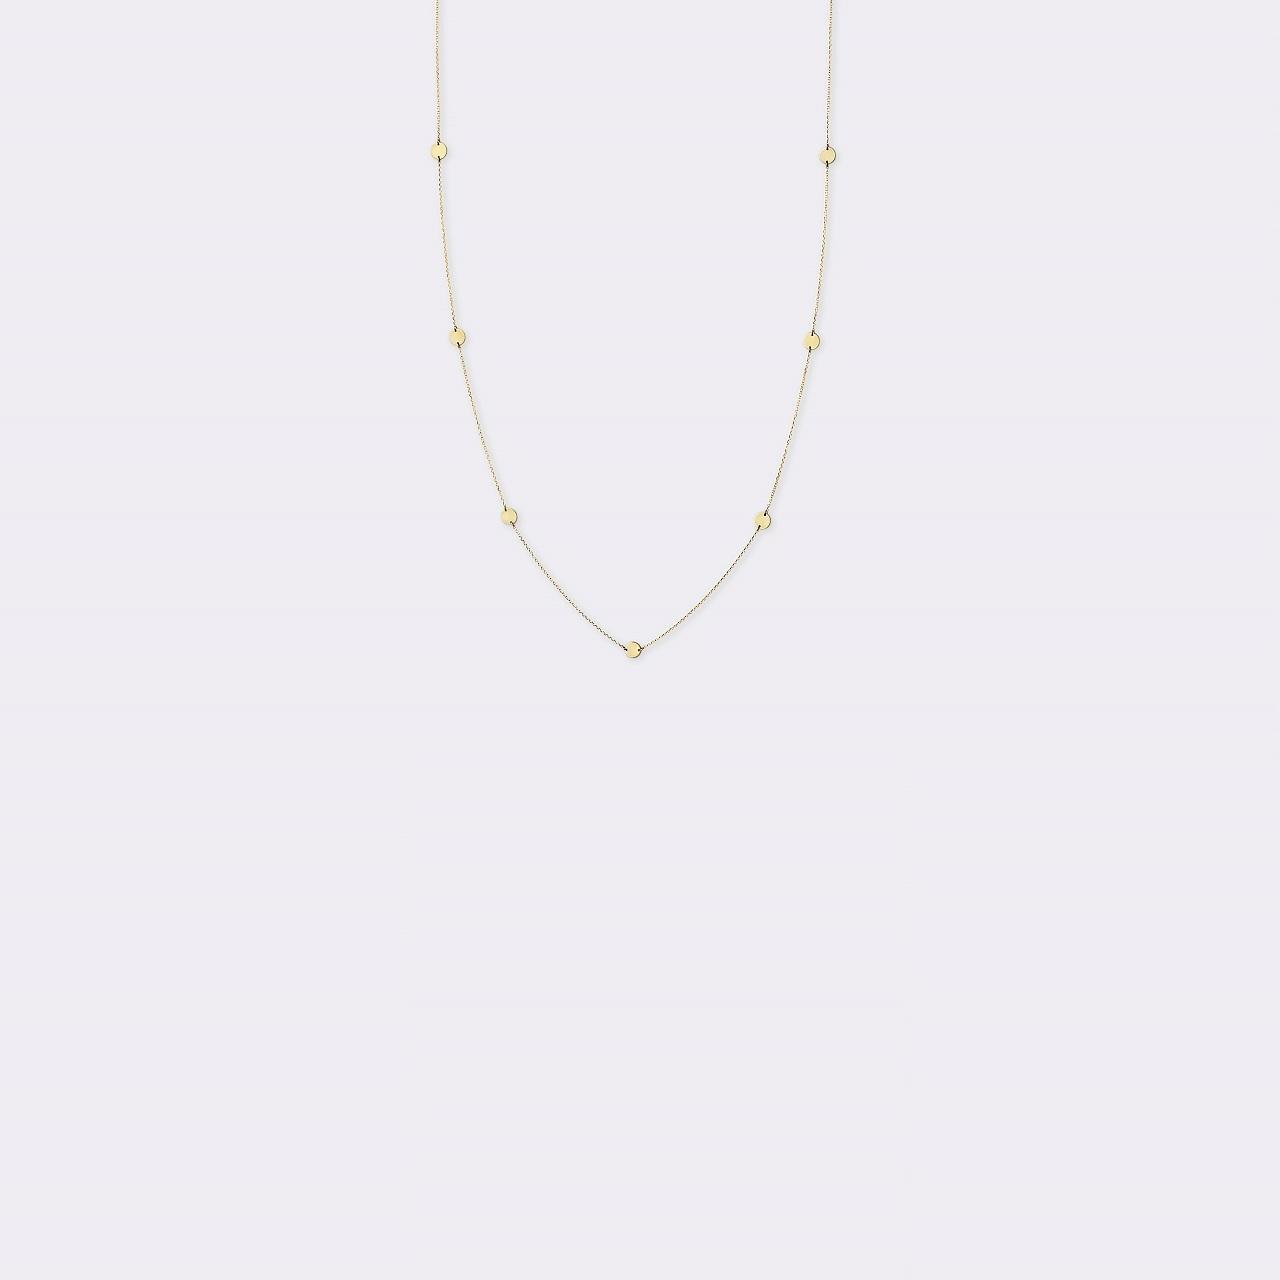 Ripple Necklace K18YG(リップルネックレス K18イエローゴールド)